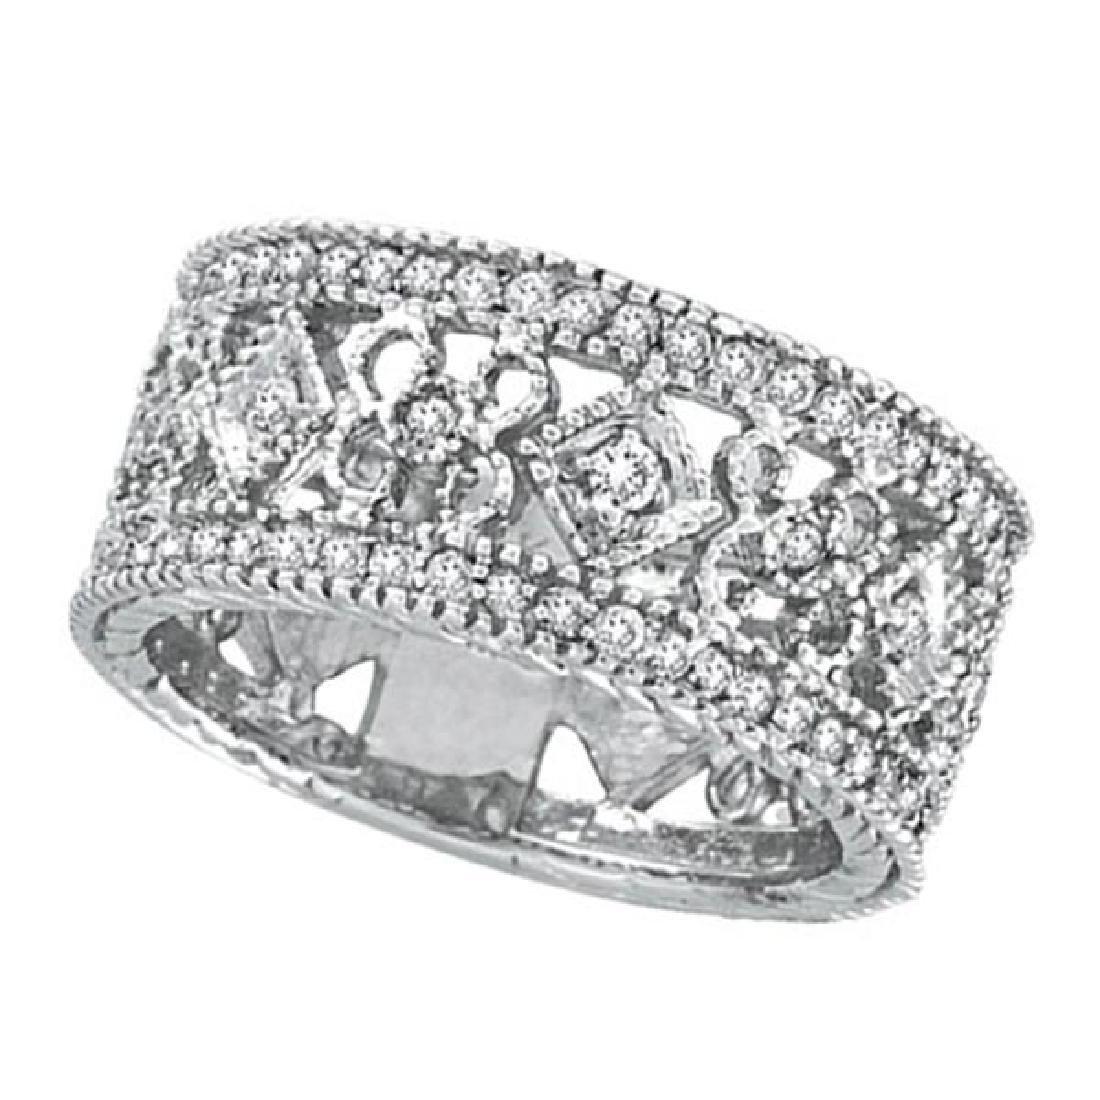 Antique Style Diamond Eternity Ring 14k White Gold